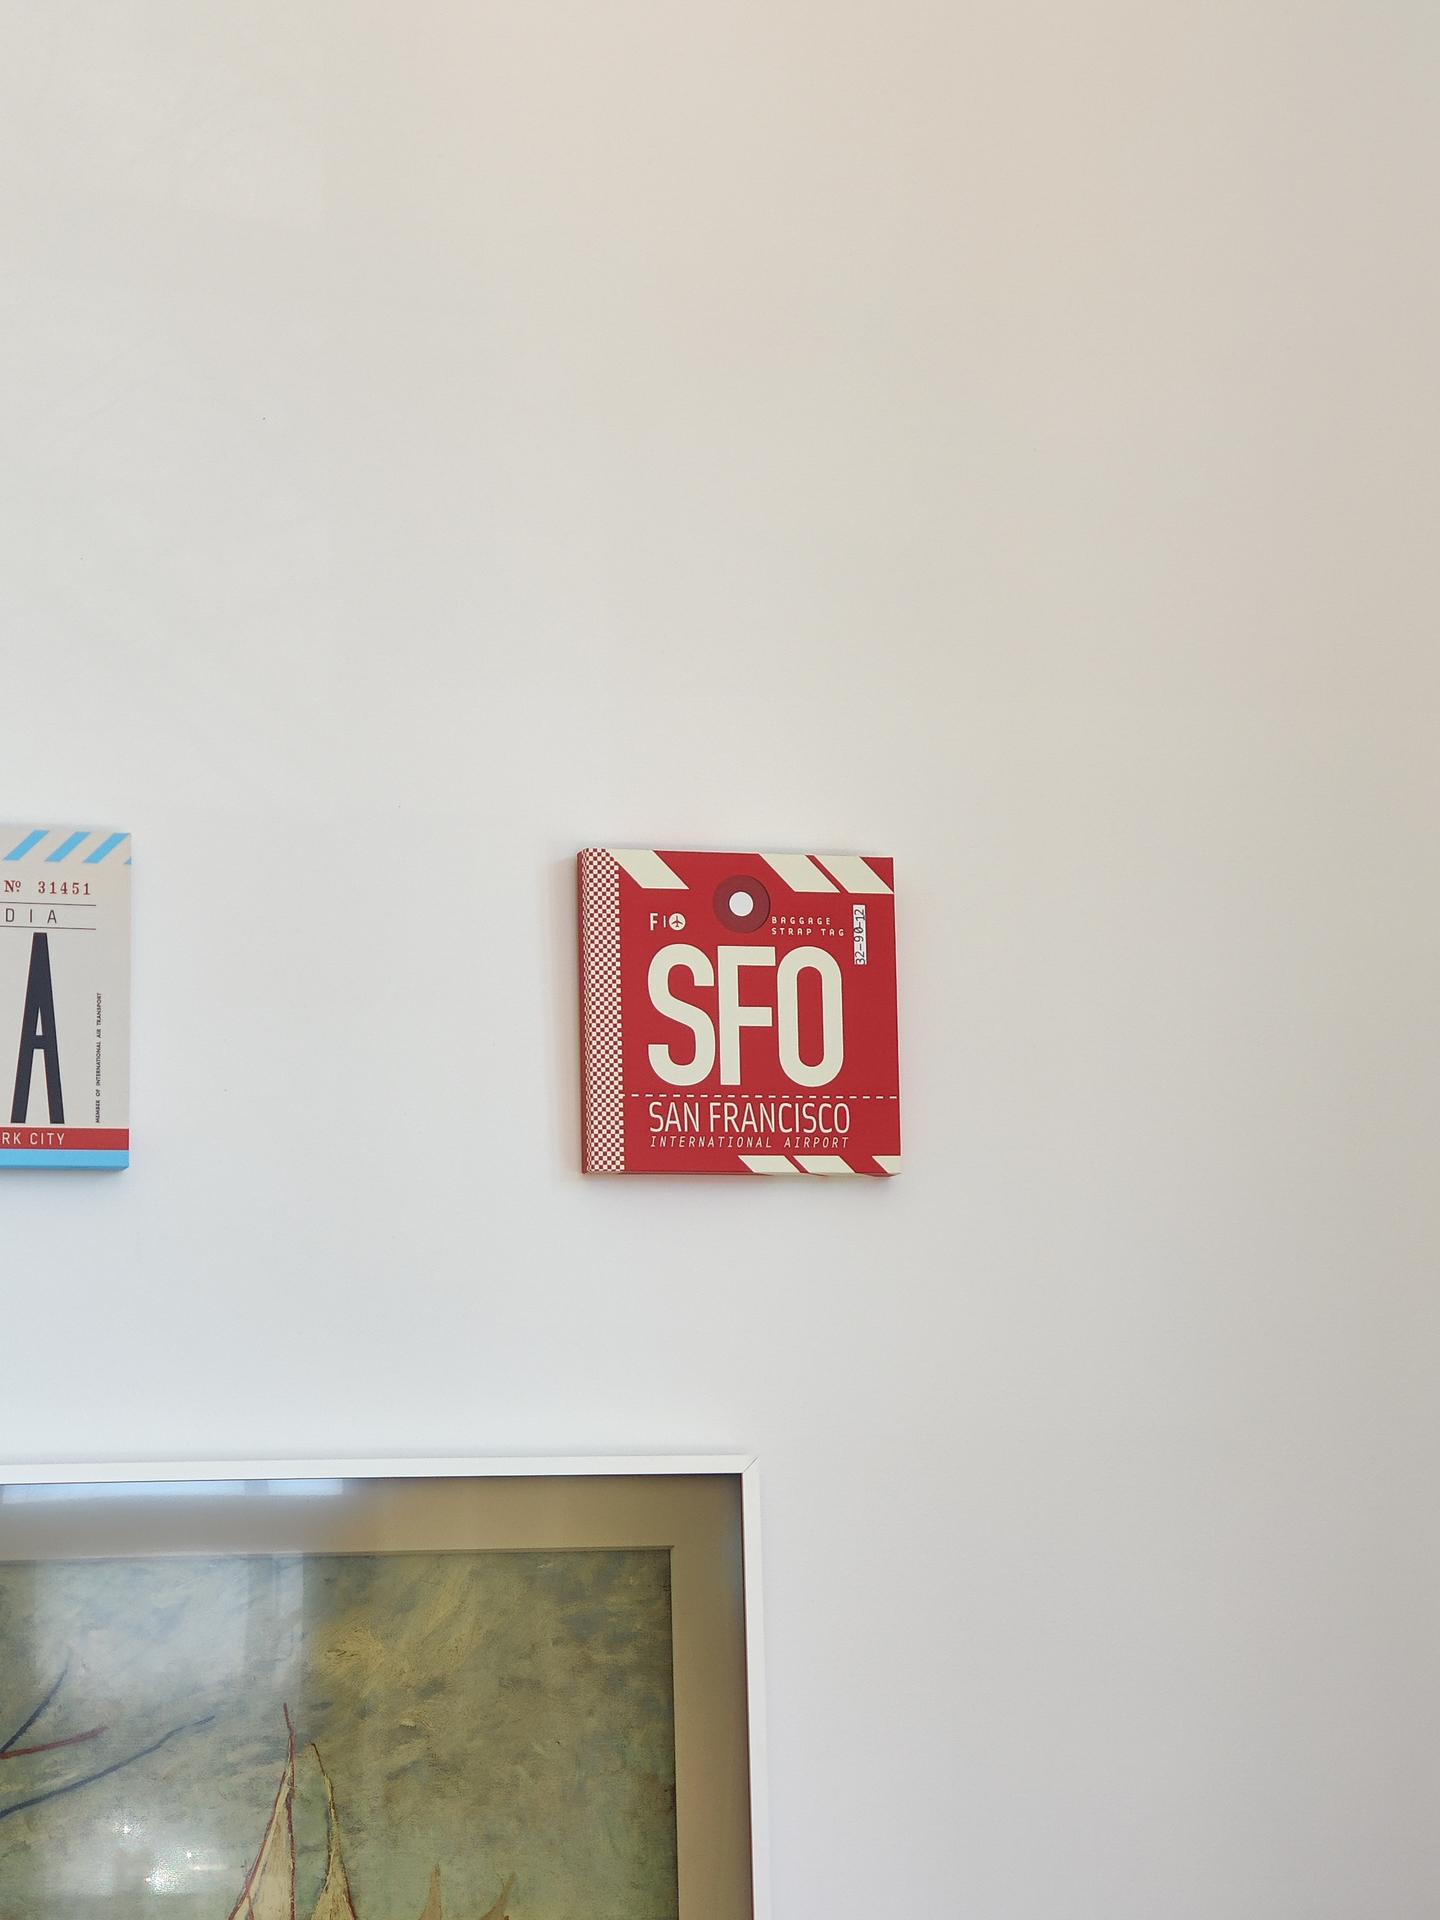 OnePlus 8 Pro sample image 3x poster